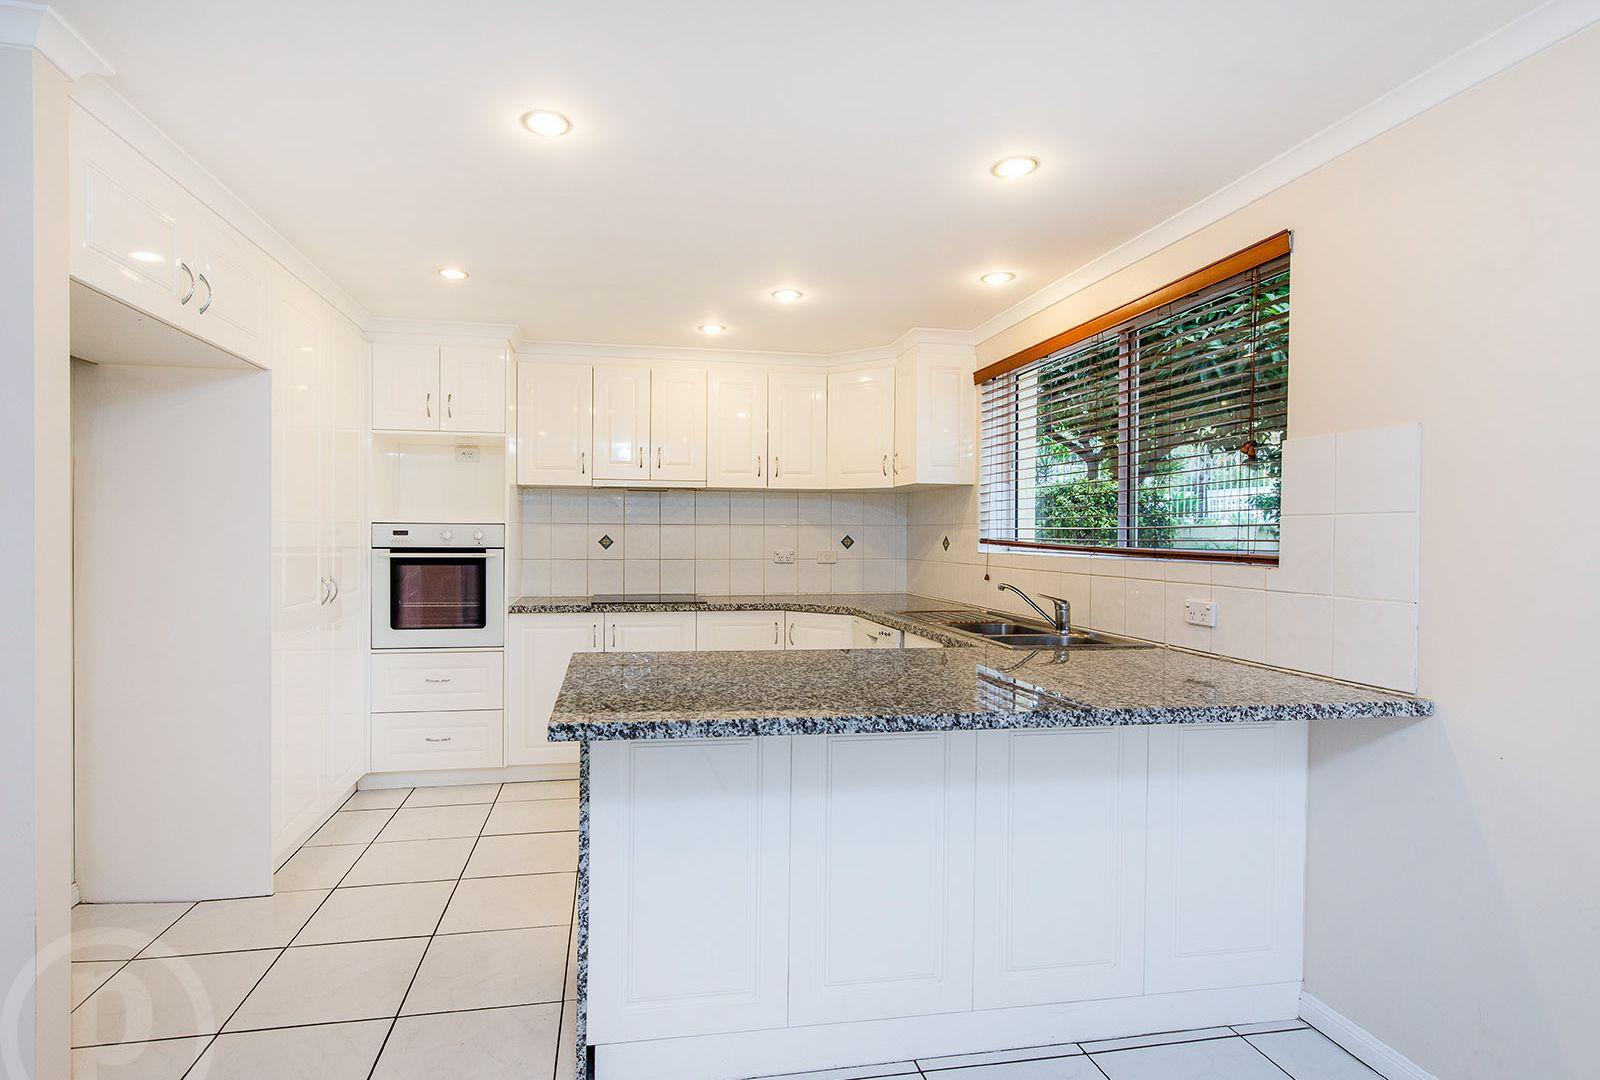 71 Granadilla Street, Macgregor QLD 4109, Image 1